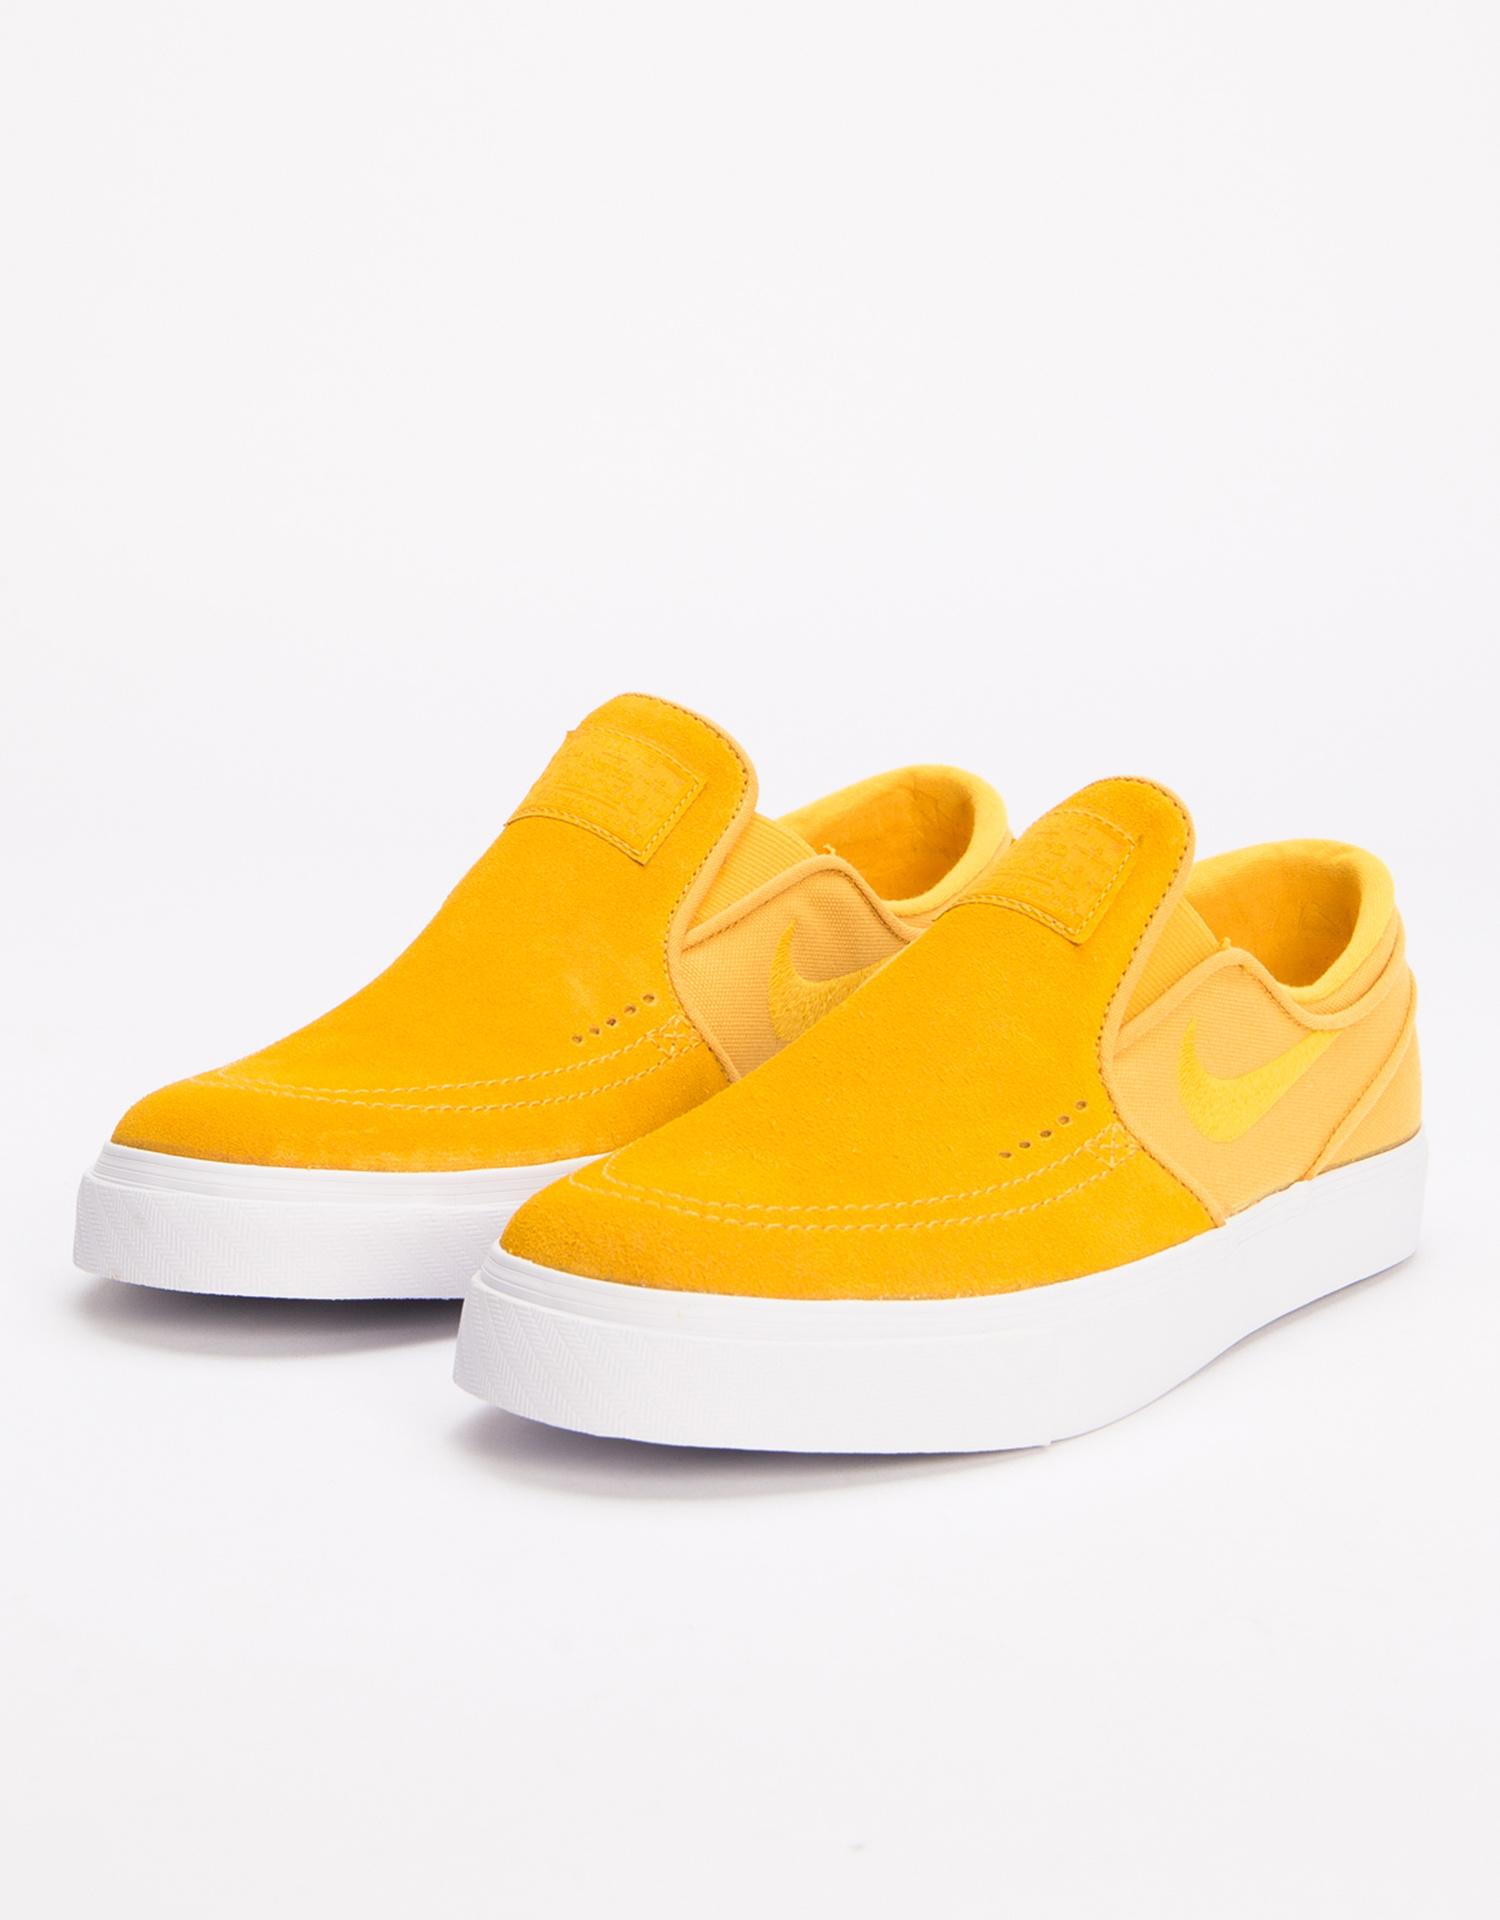 cheap for discount b31ea 759a5 Nike Sb Zoom Stefan Janoski Slip Yellow Ochre Yellow Ochre-White - Lockwood  Skateshop